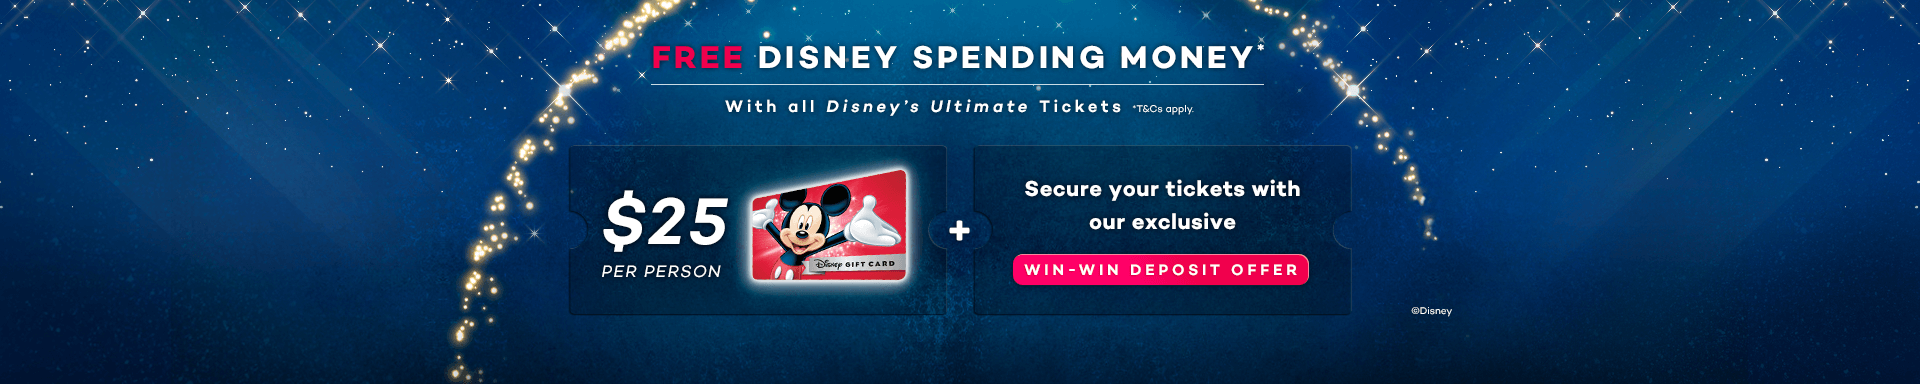 $25 Disney Spending Money Per Person